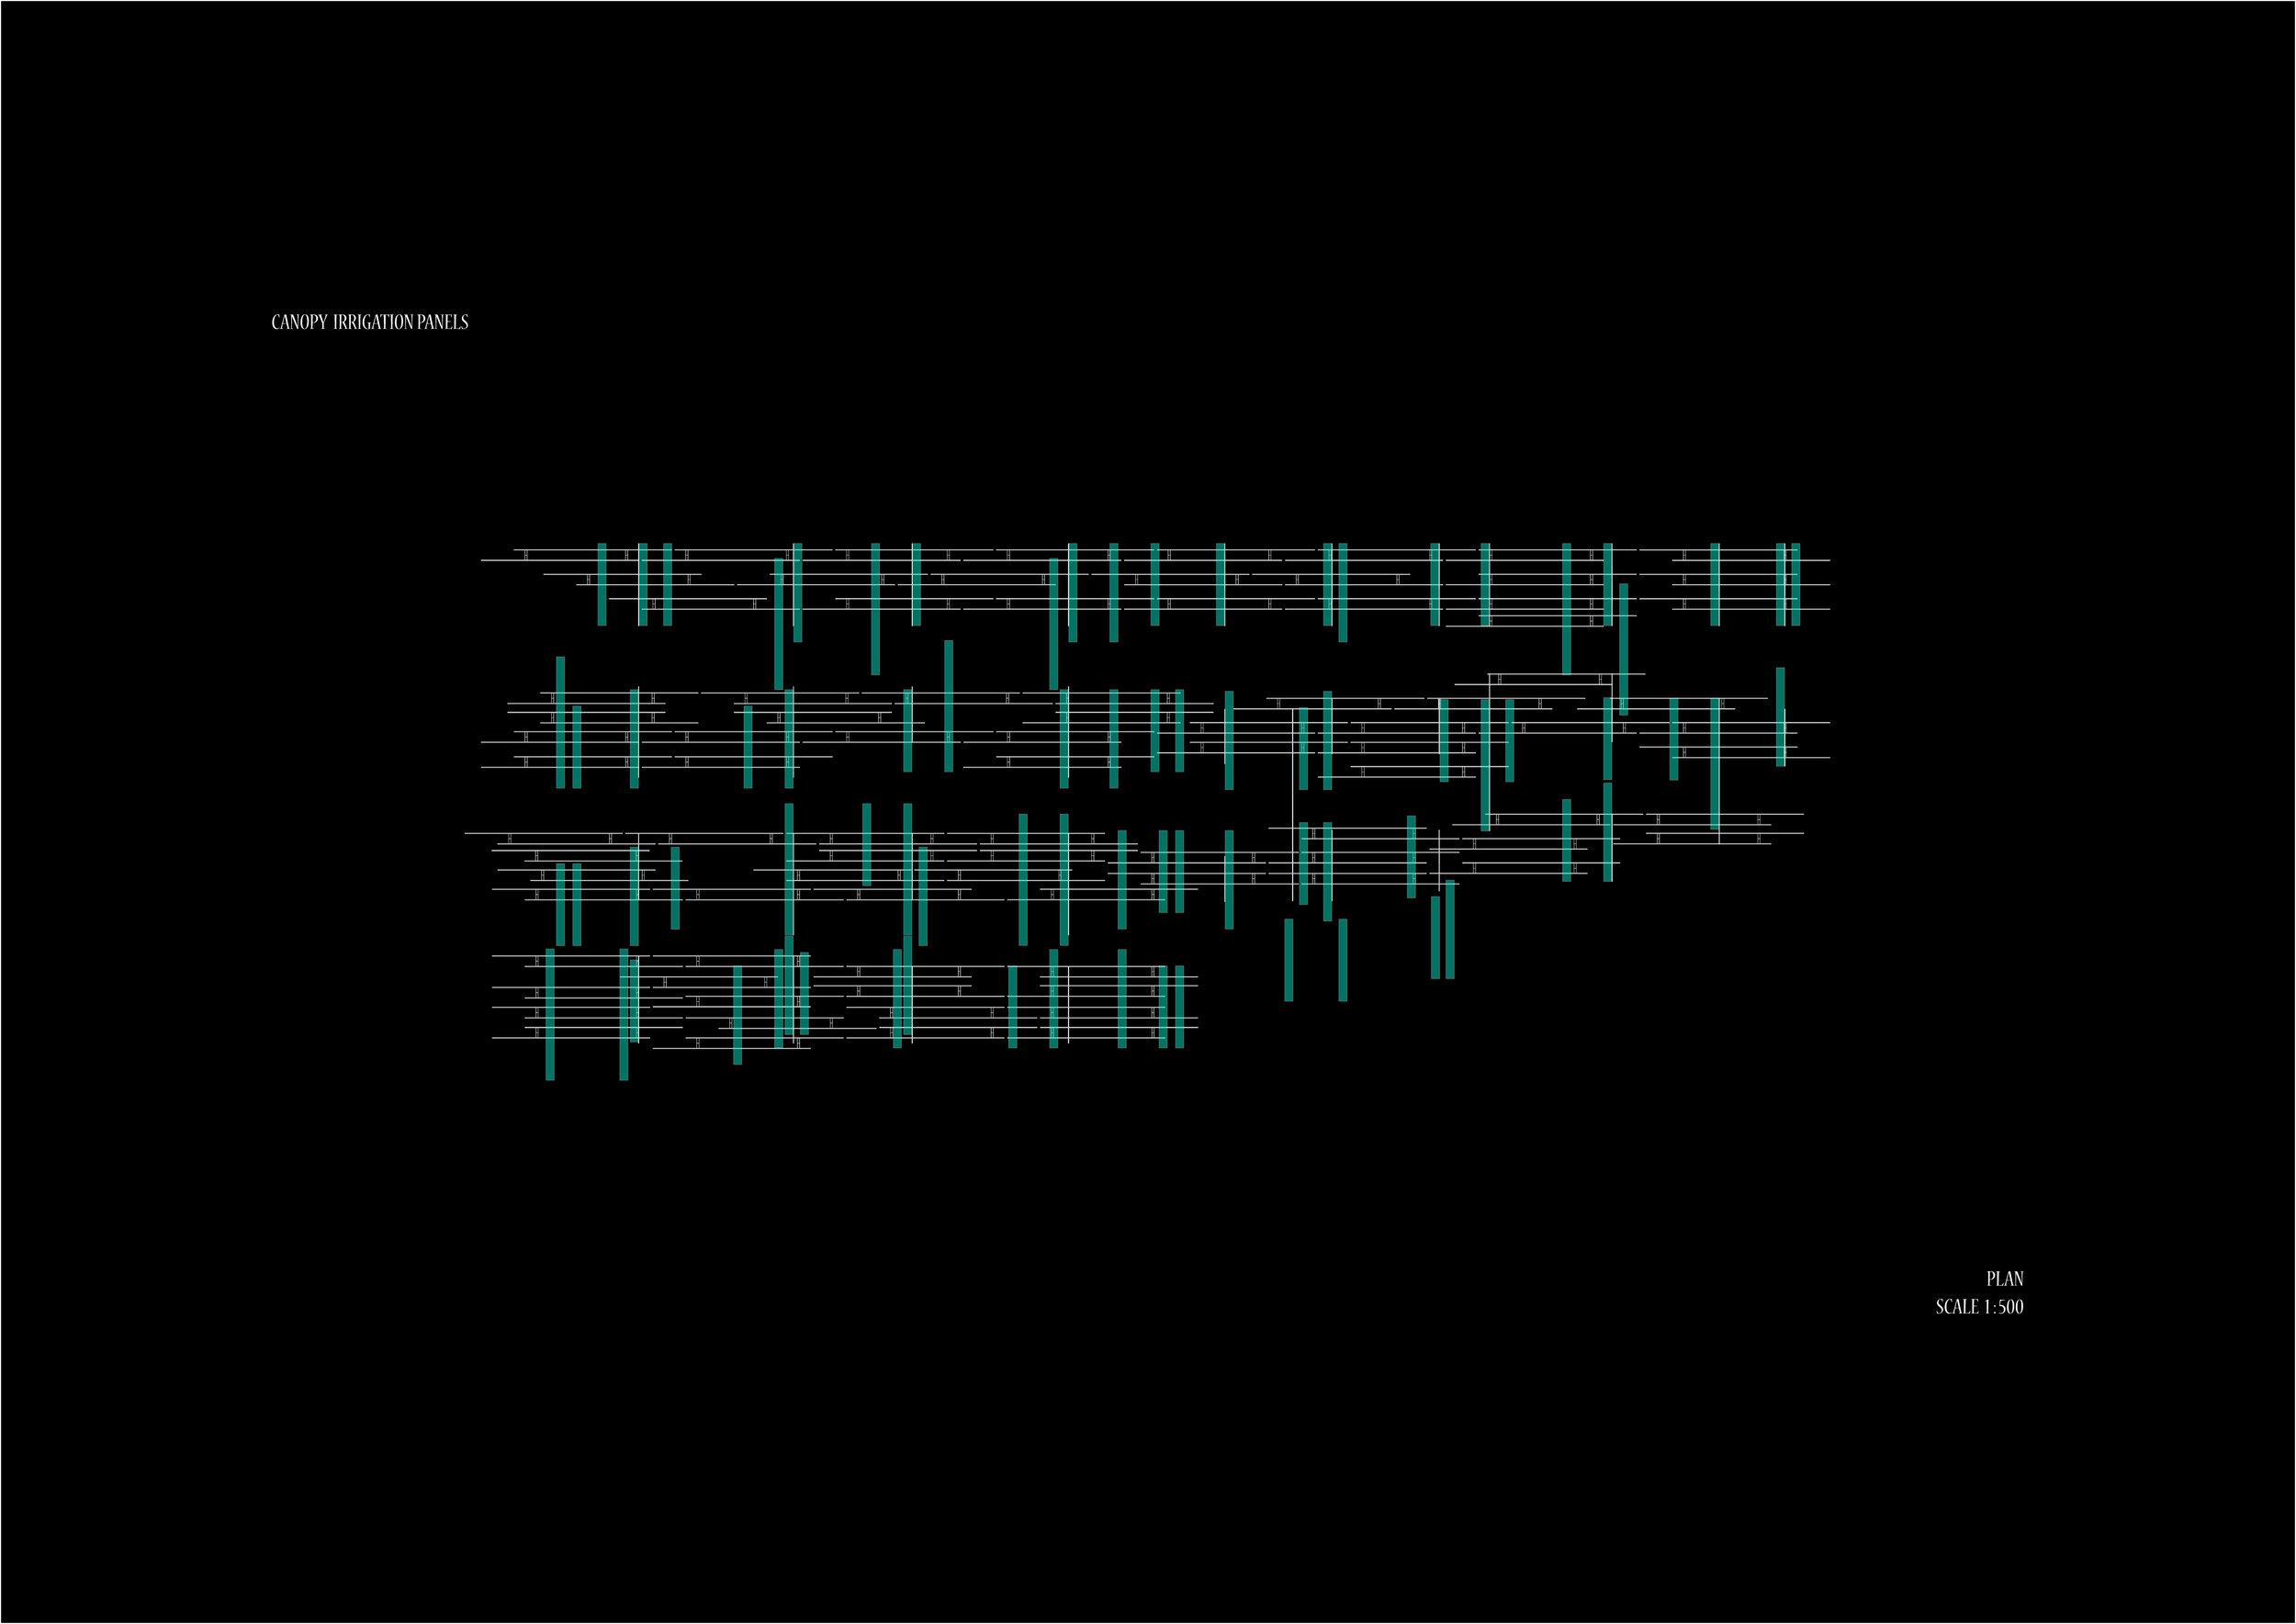 Diagram18_CanopyIrrigation.jpg